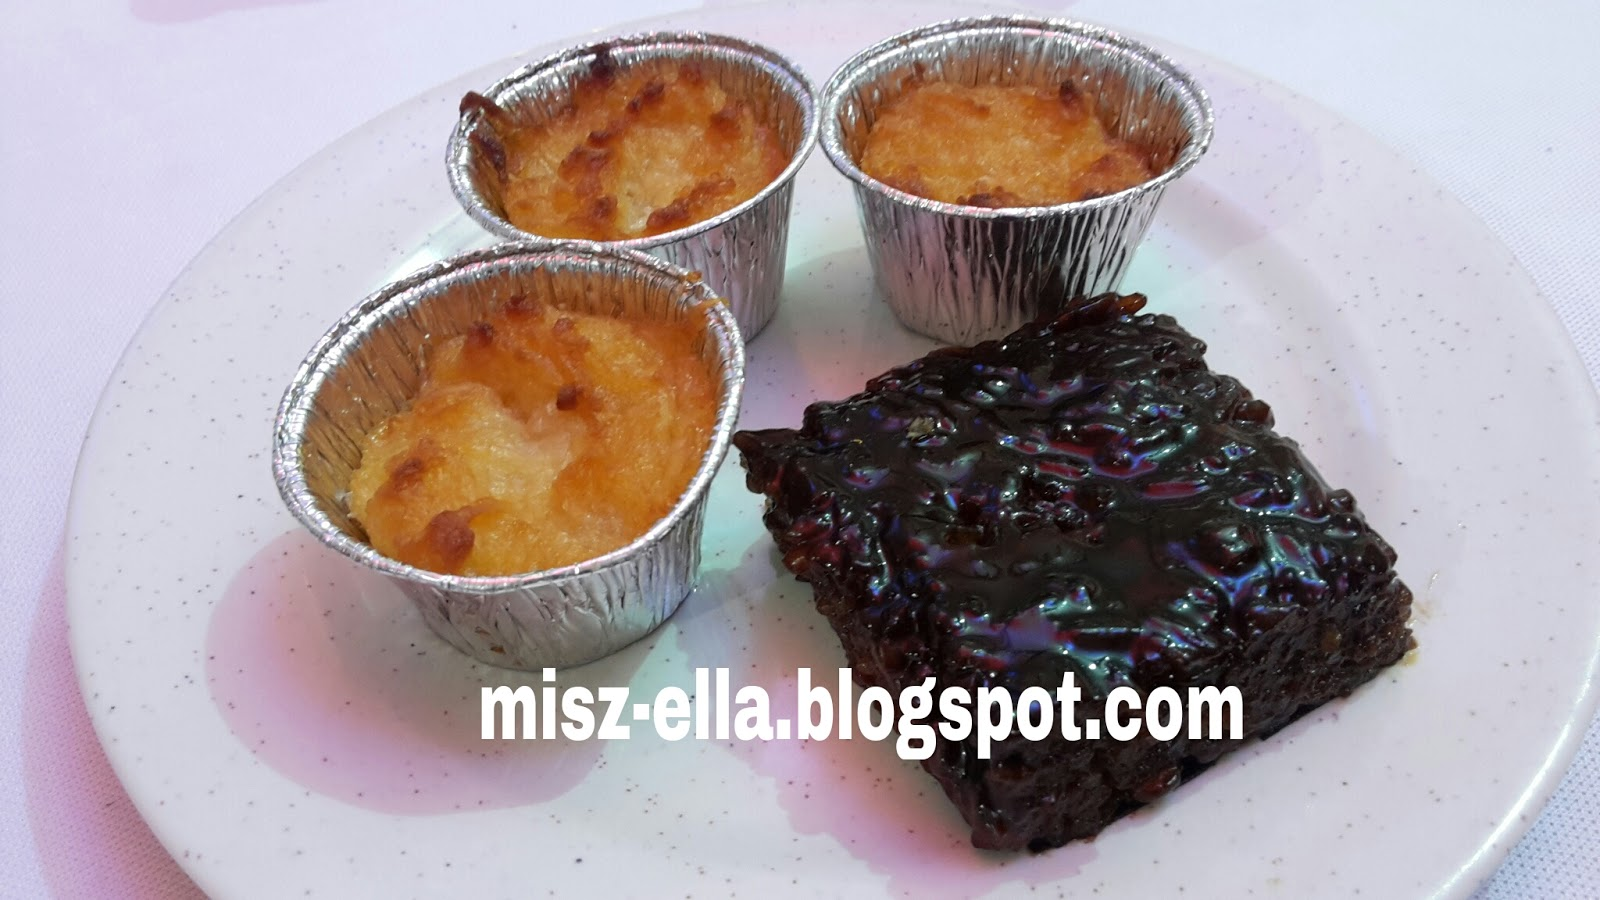 Philippines Halal Food At Hotel Malaysia 2015 Dari Jari Produk Ukm Bingka Cassava Cake And Biko That I Tried The Embassy Event Recently Slightly Same With Our Malay Ubi Kayu Wajik But Theirs Is